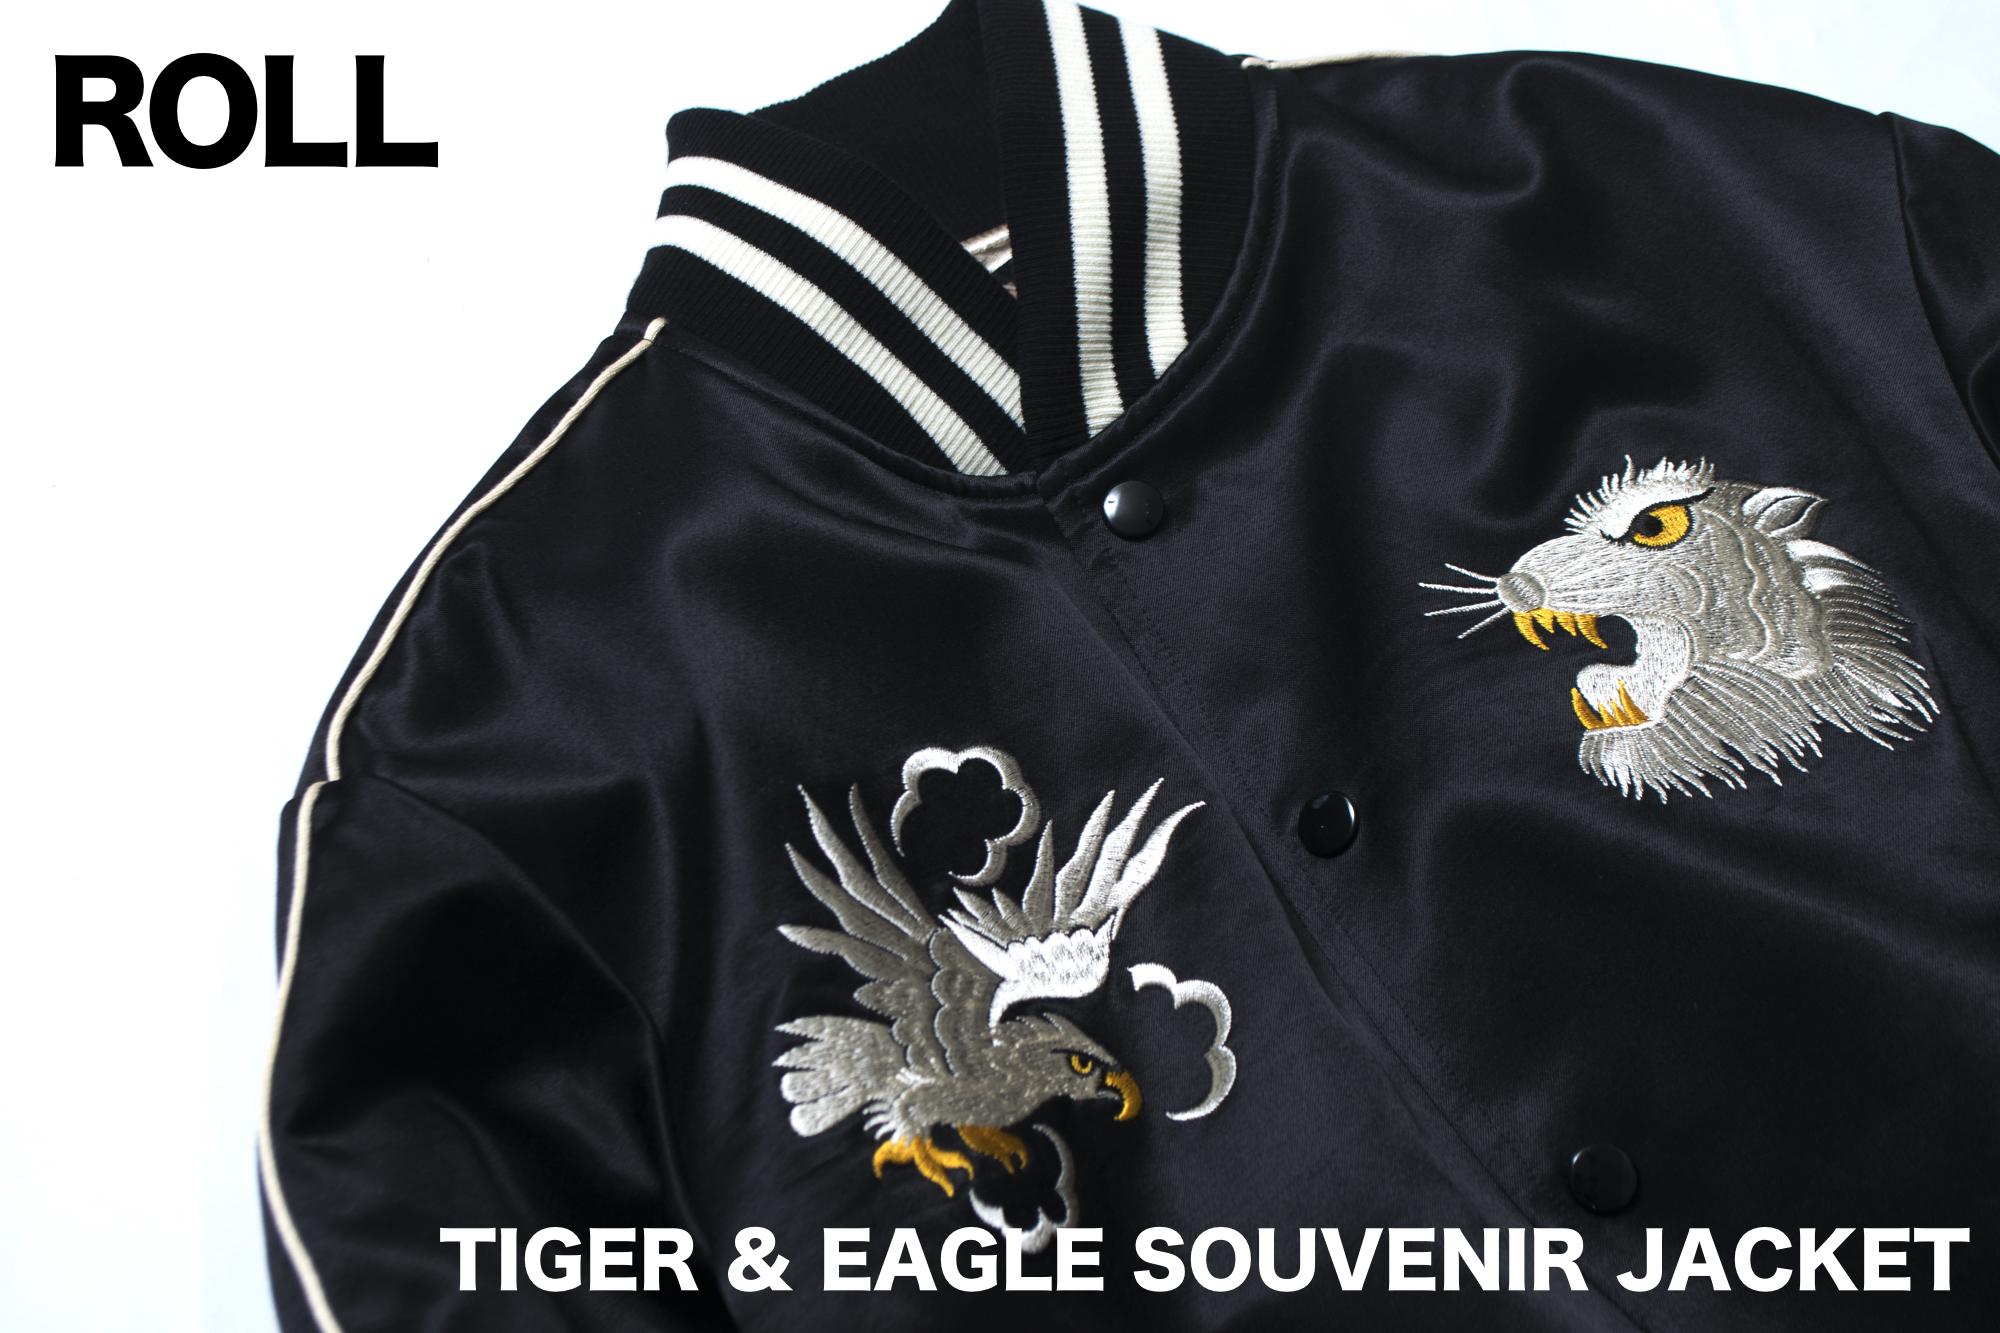 TIGER & EAGLE